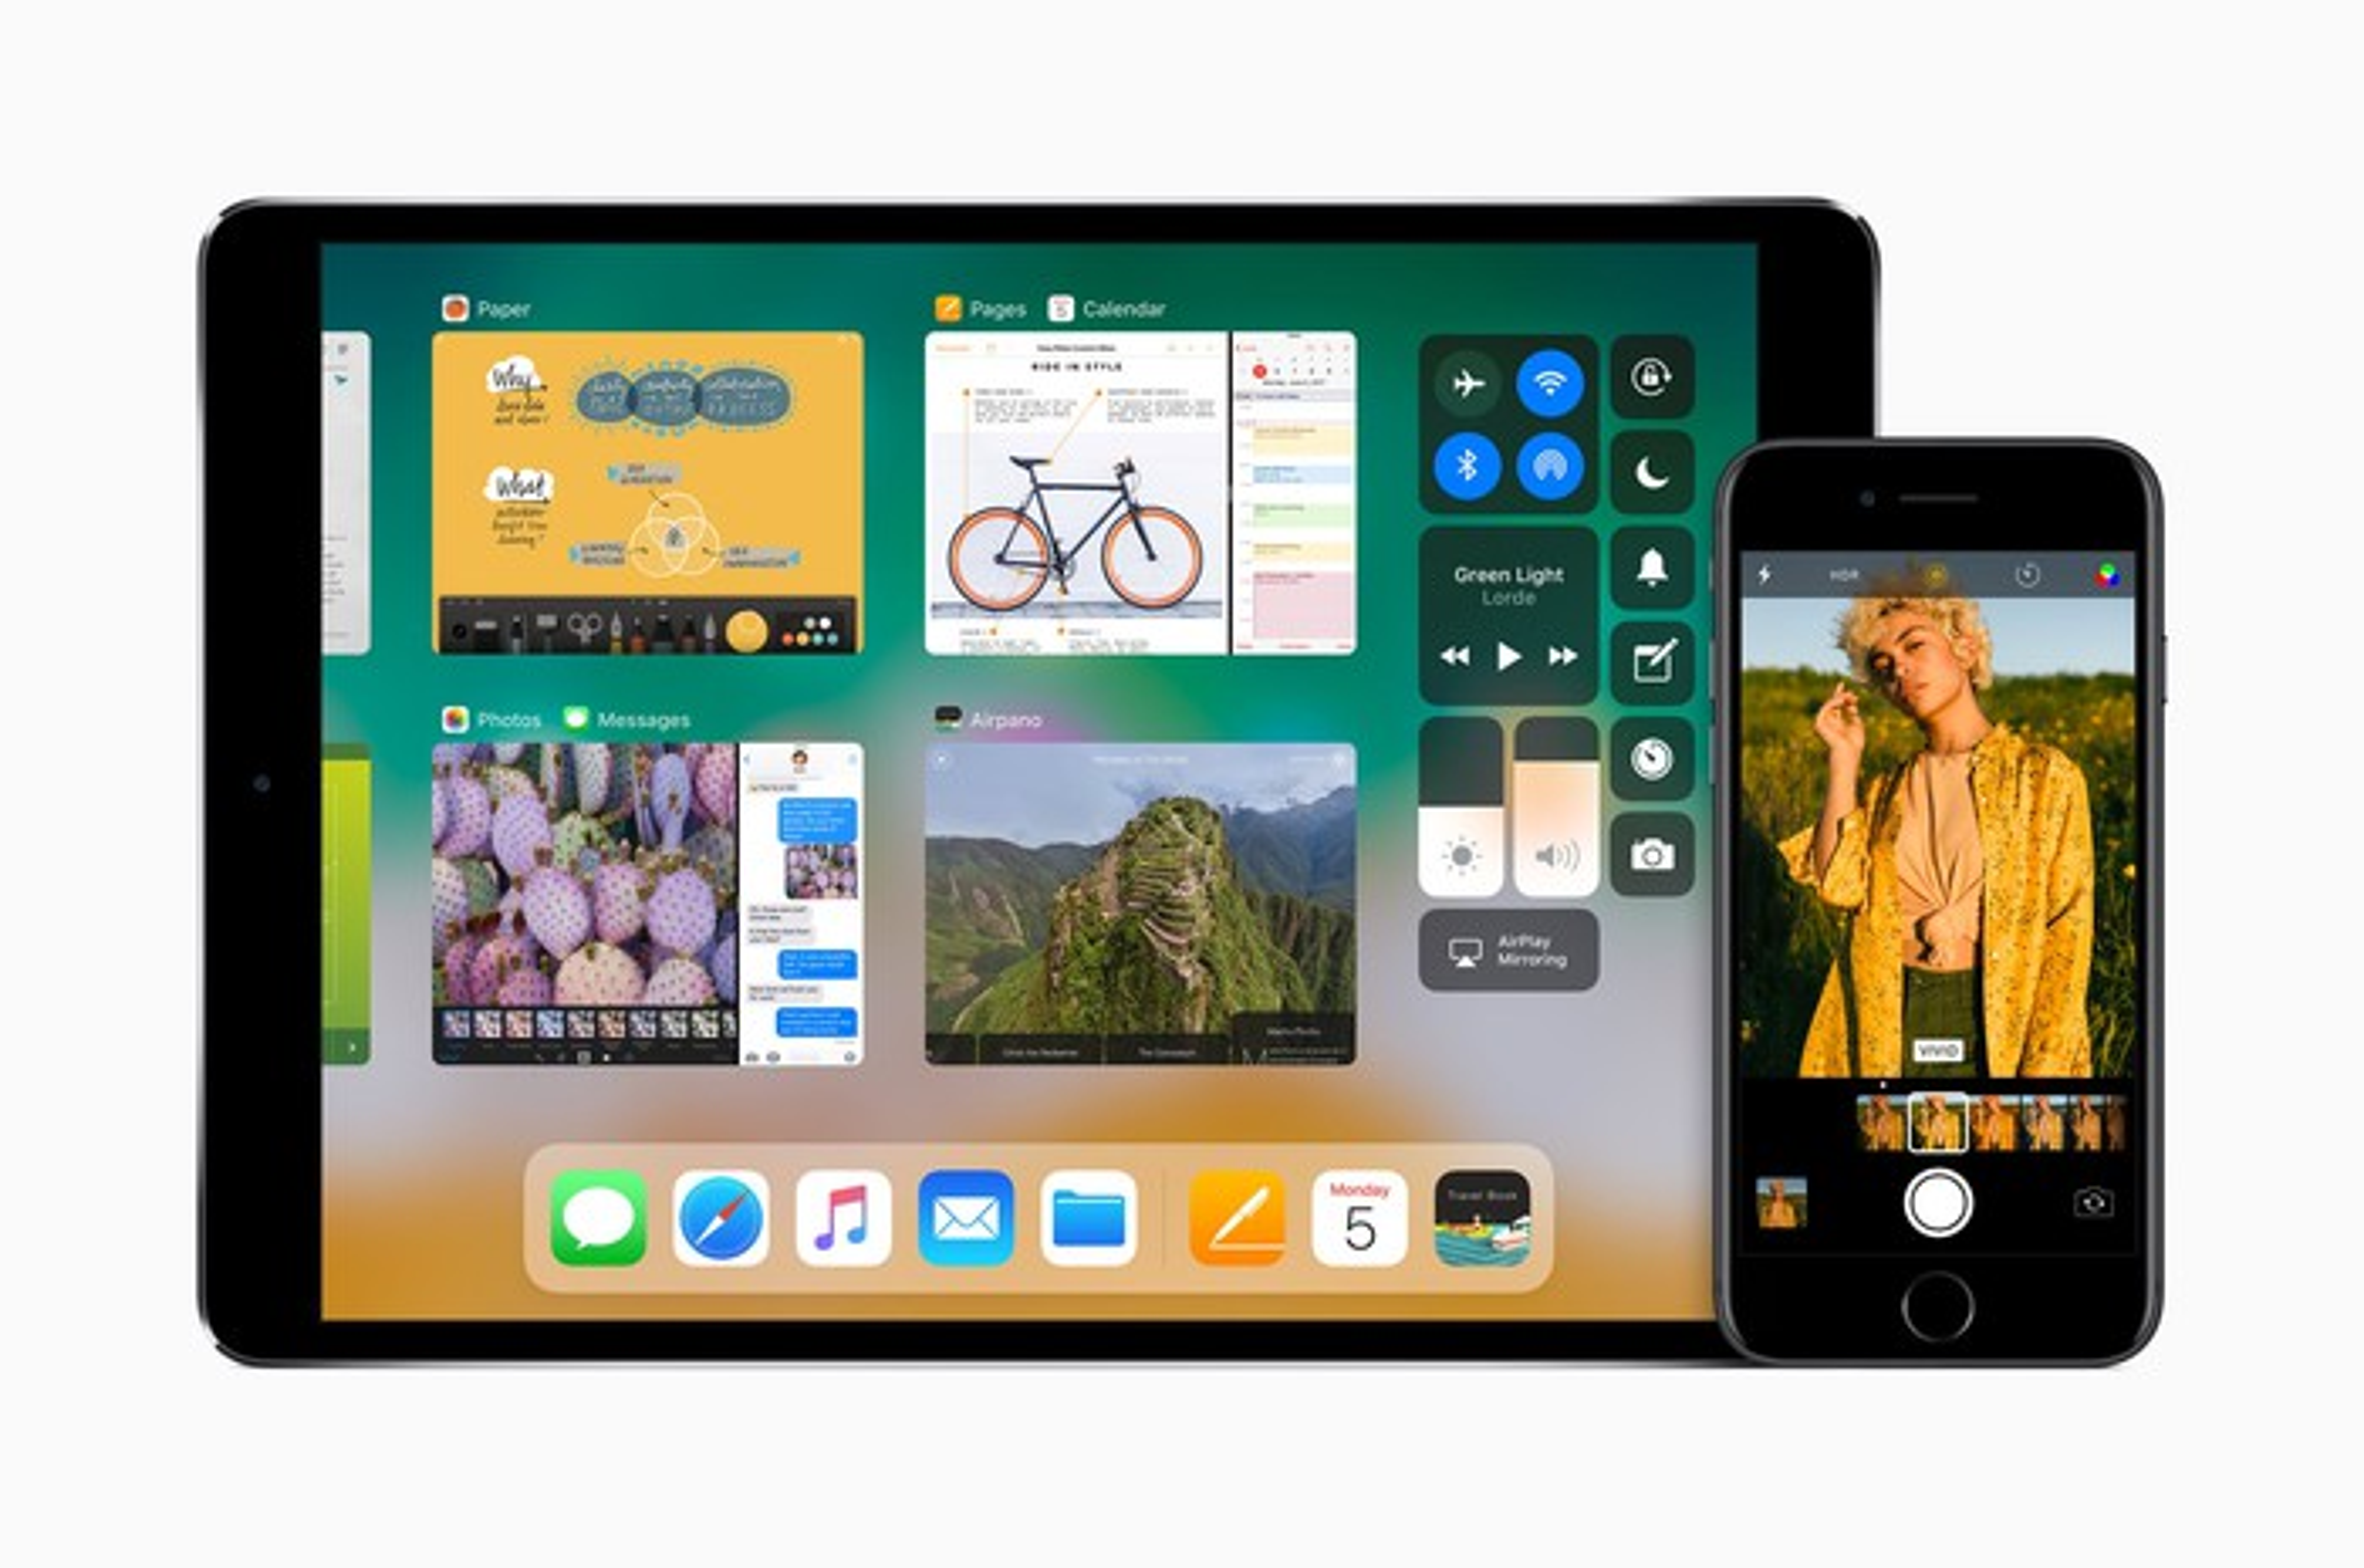 An Apple iPad next to an Apple iPhone.